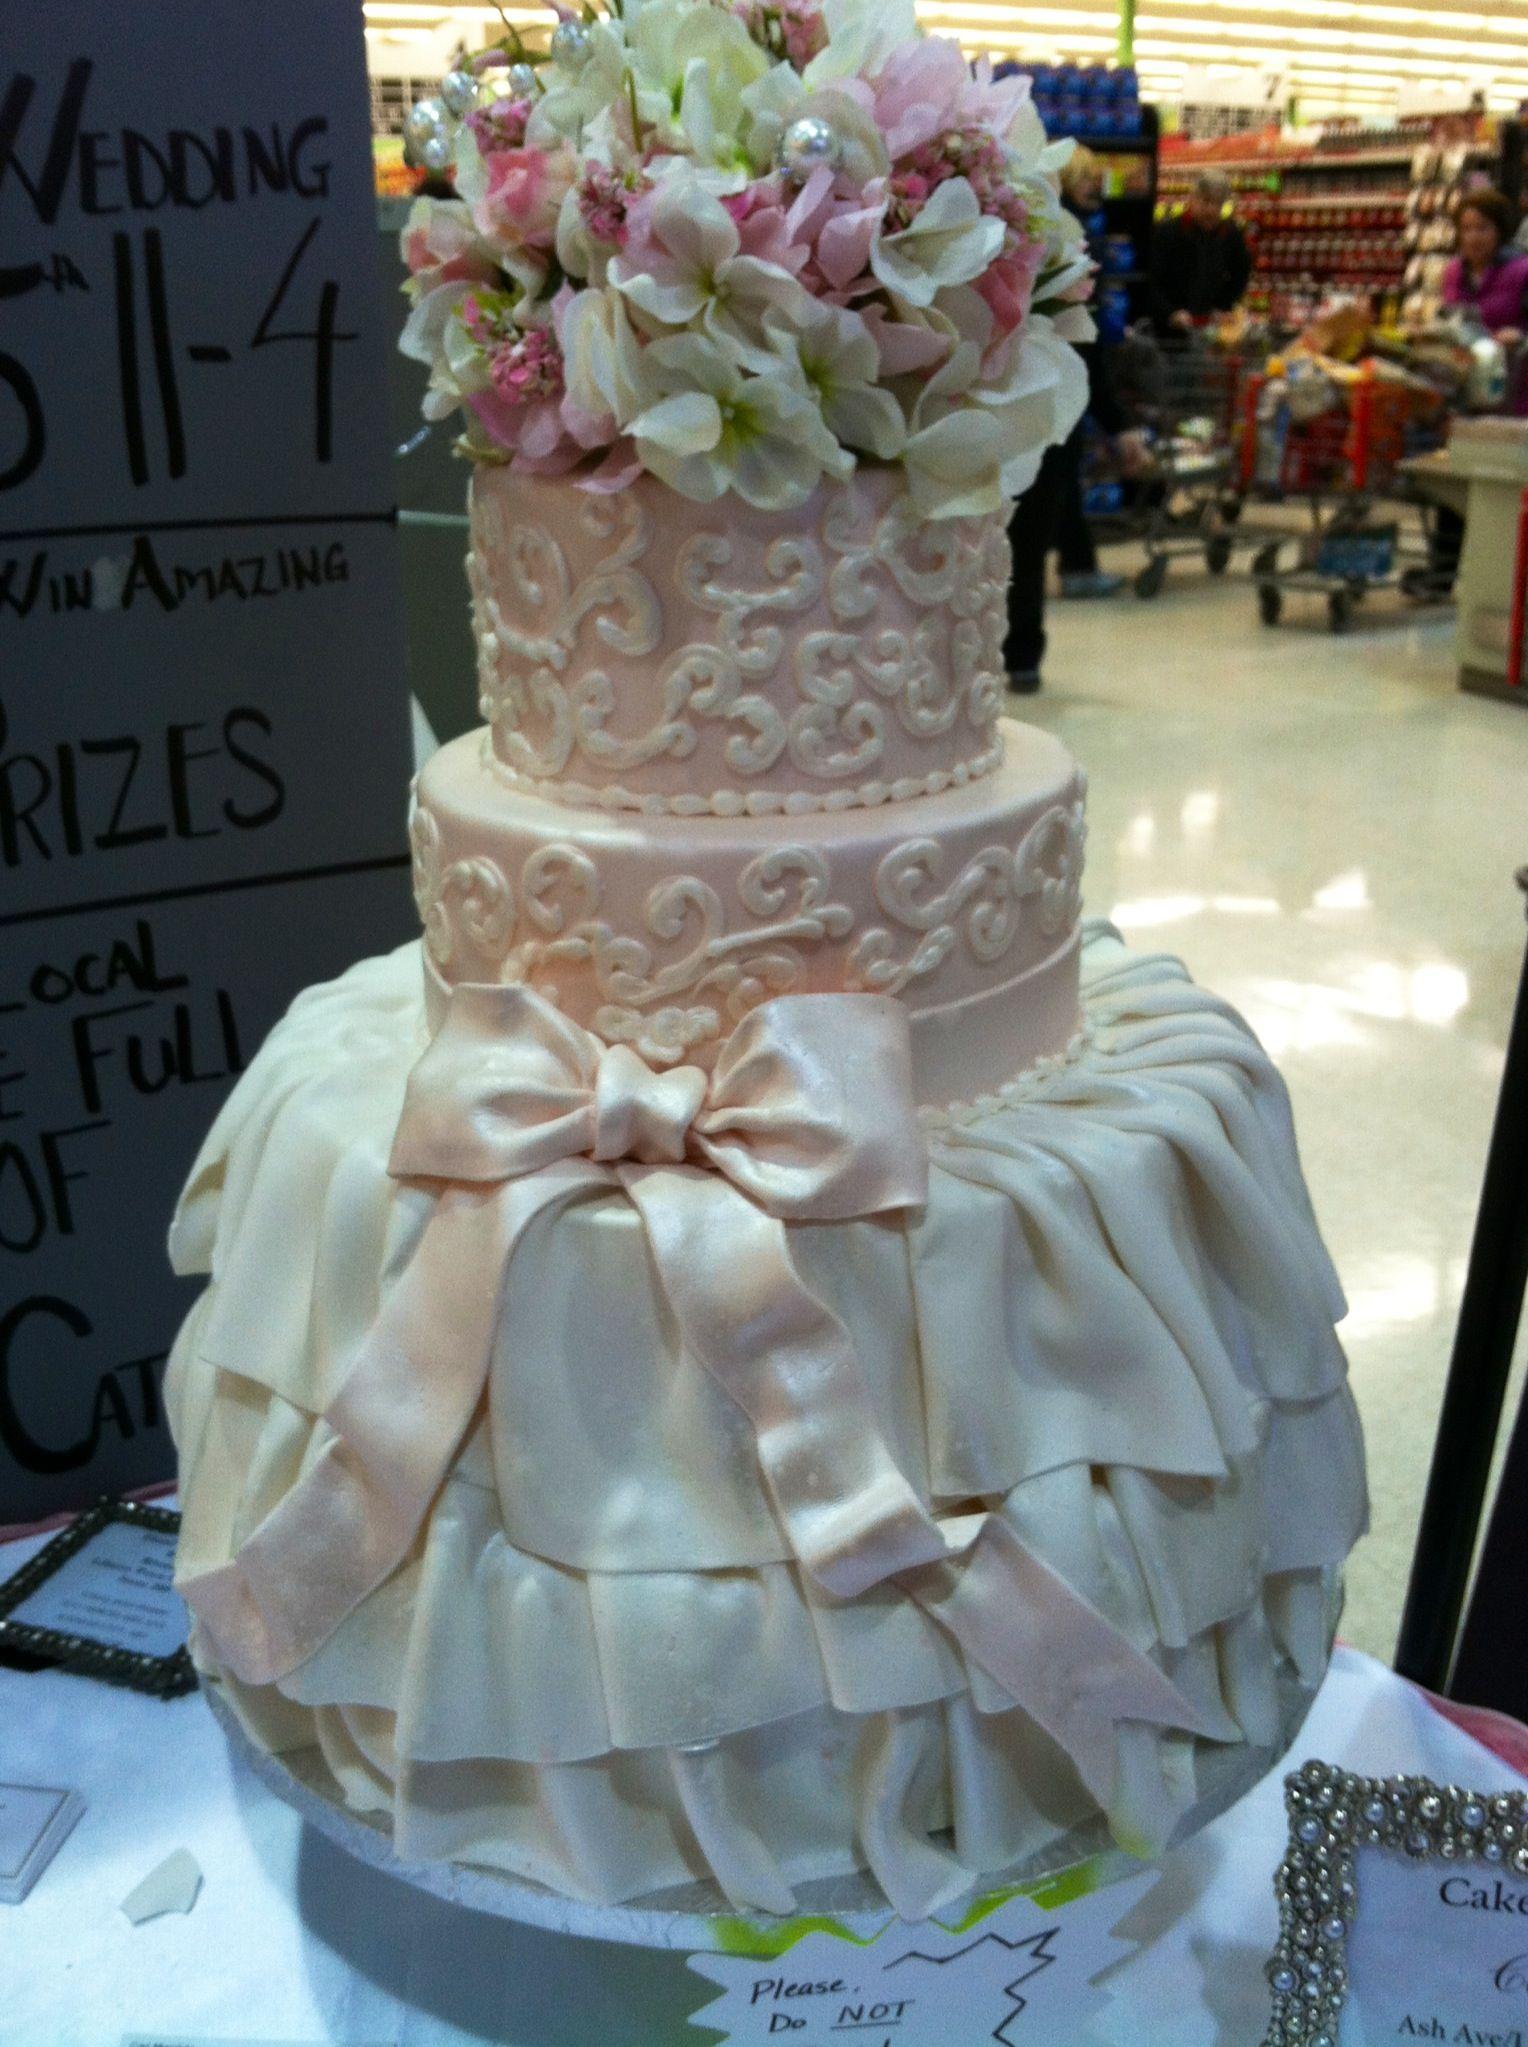 Wedding Cake At The Store Price Chopper Lovely Cake Wedding